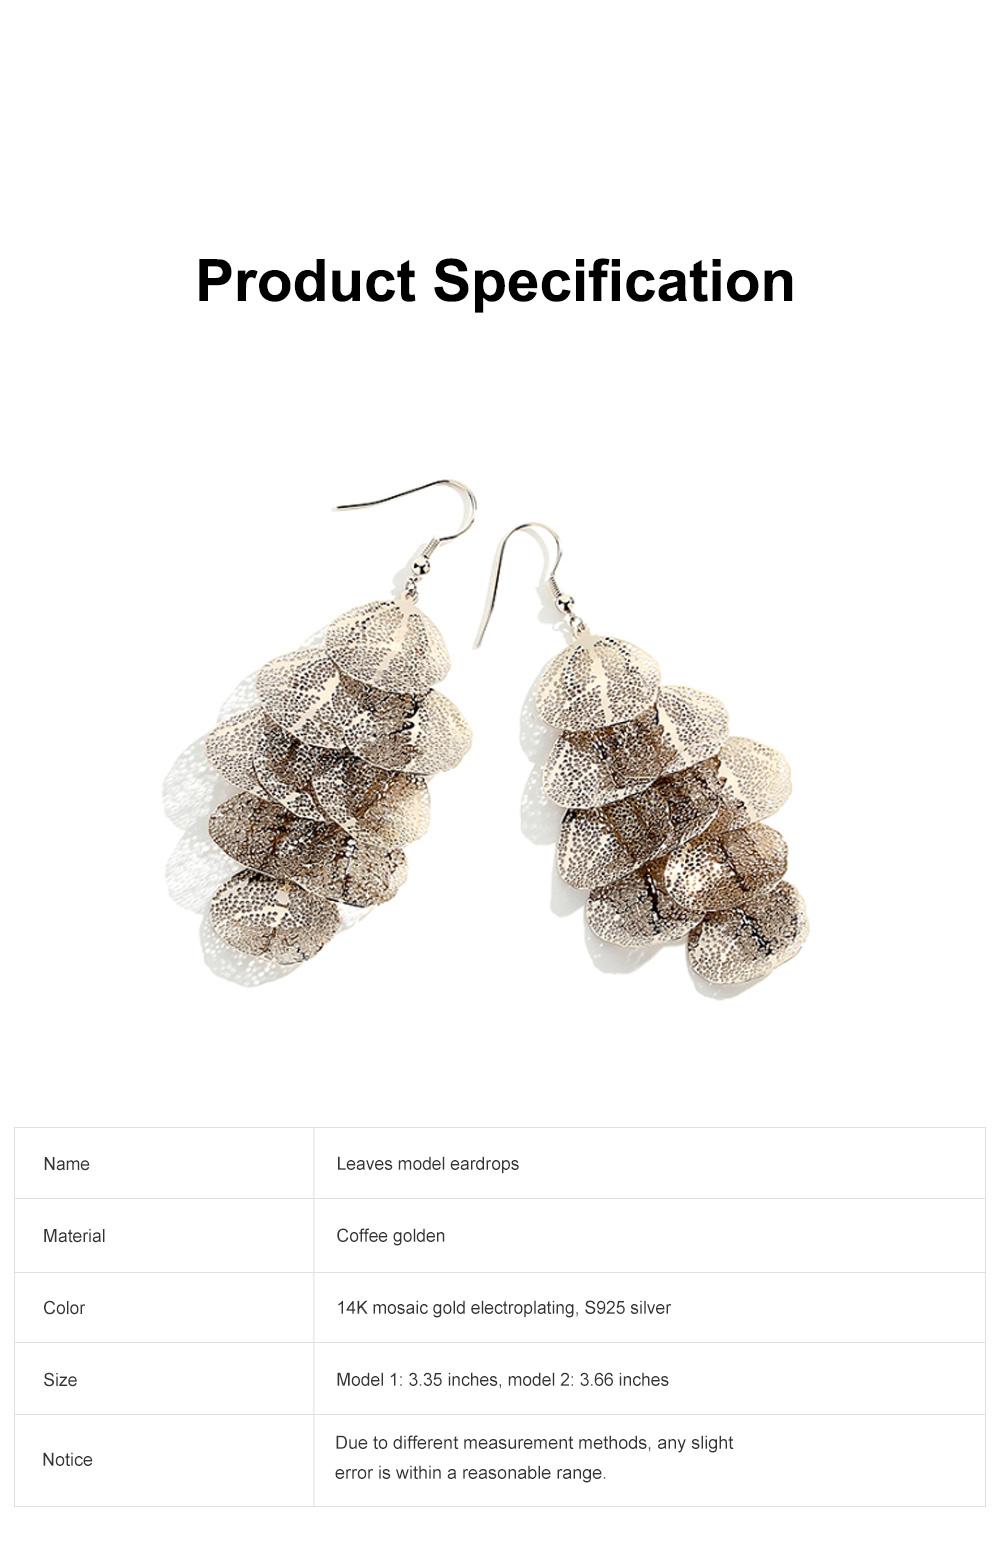 CAROMAY Stylish Elegant Vintage Delicate Hollow Leaf Model Tassels Silver Eardrops Earrings with Mirror Polishing Electroplating 6